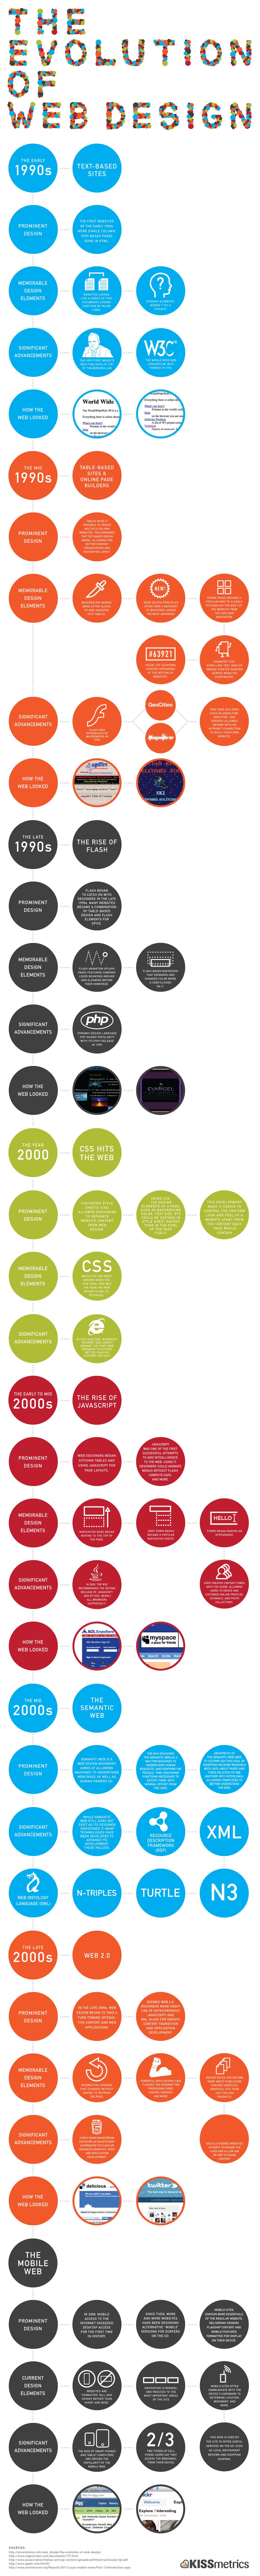 The Evolution of Web Design